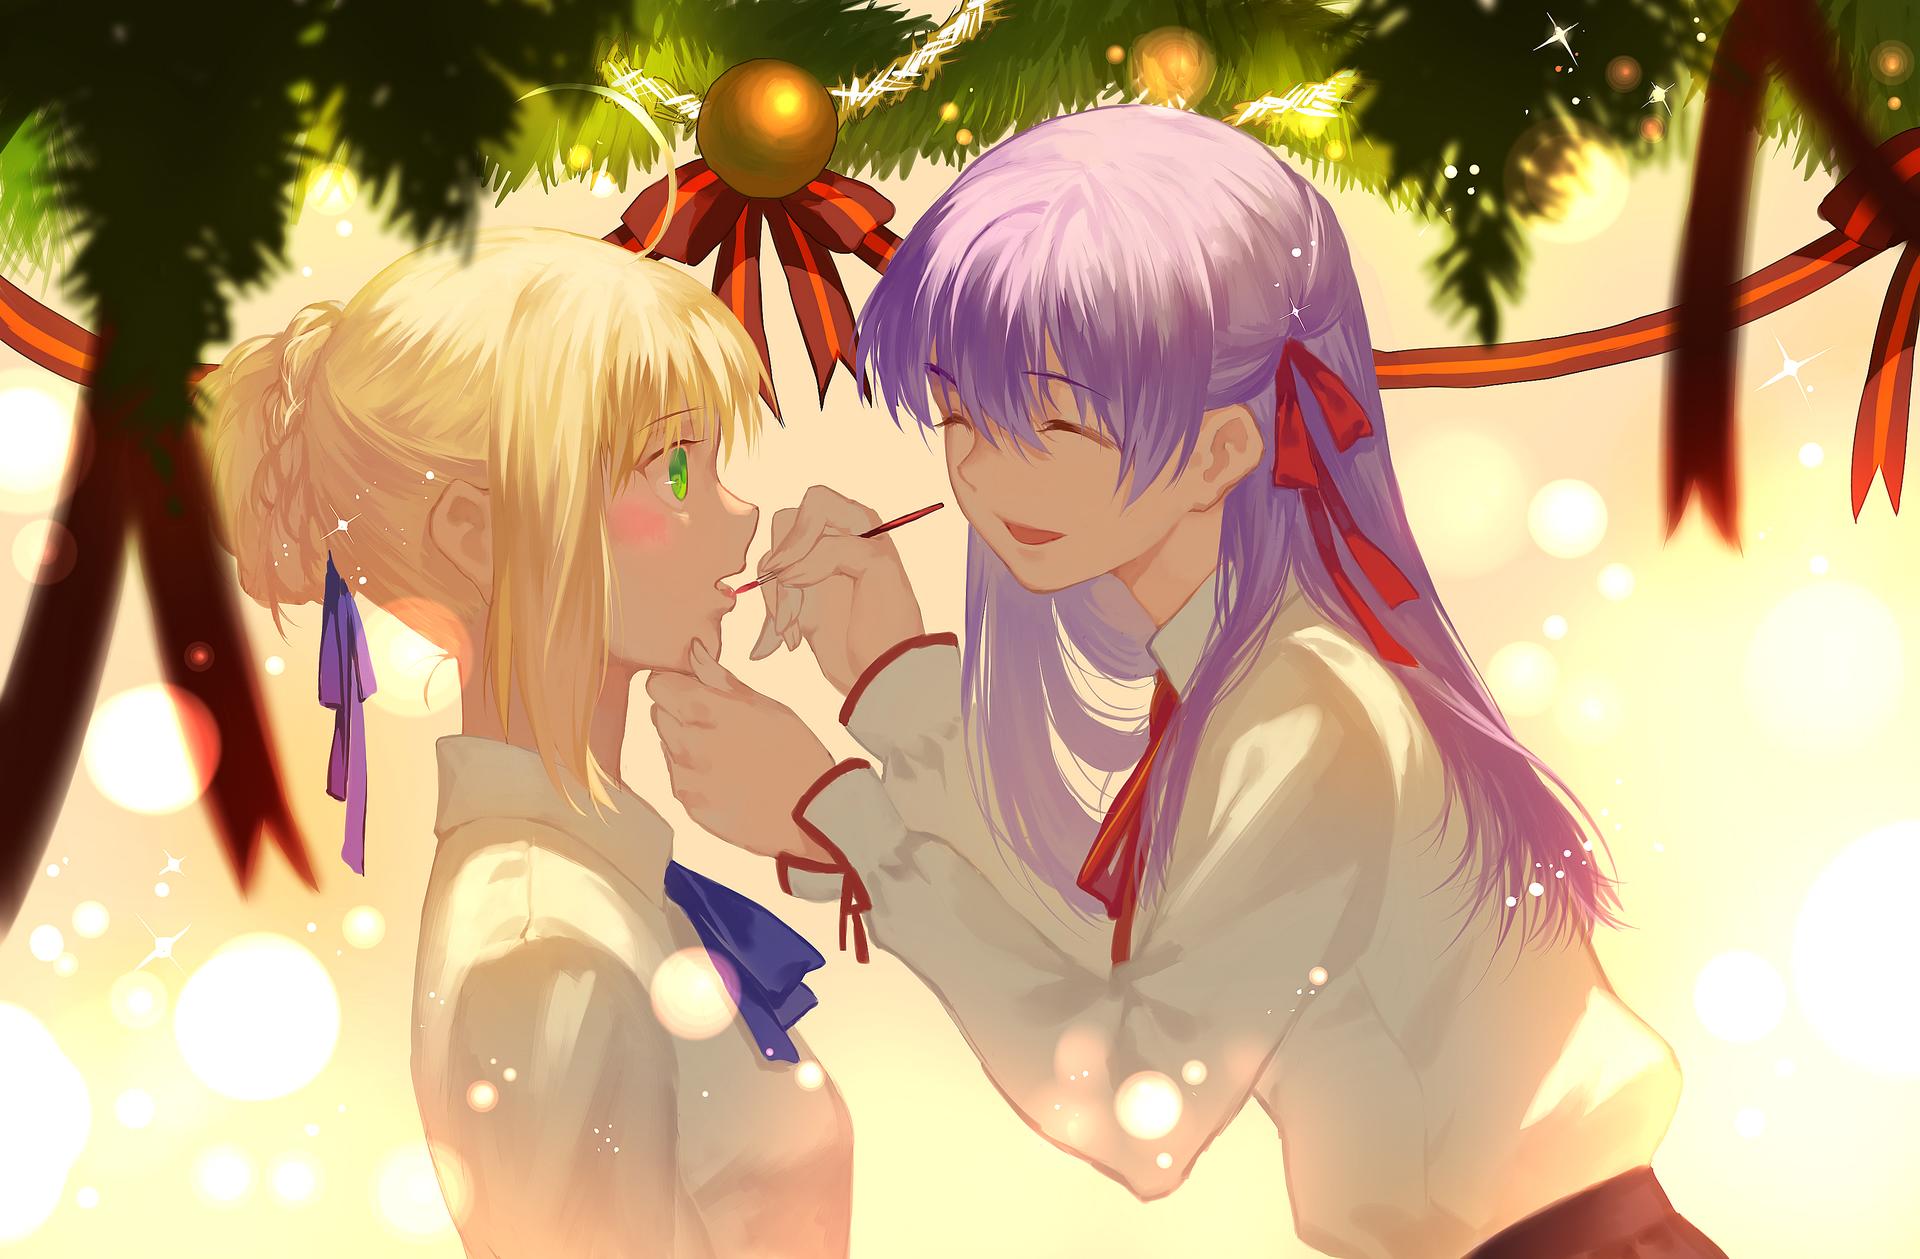 Fate/stay night Image #1816401 - Zerochan Anime Image Board